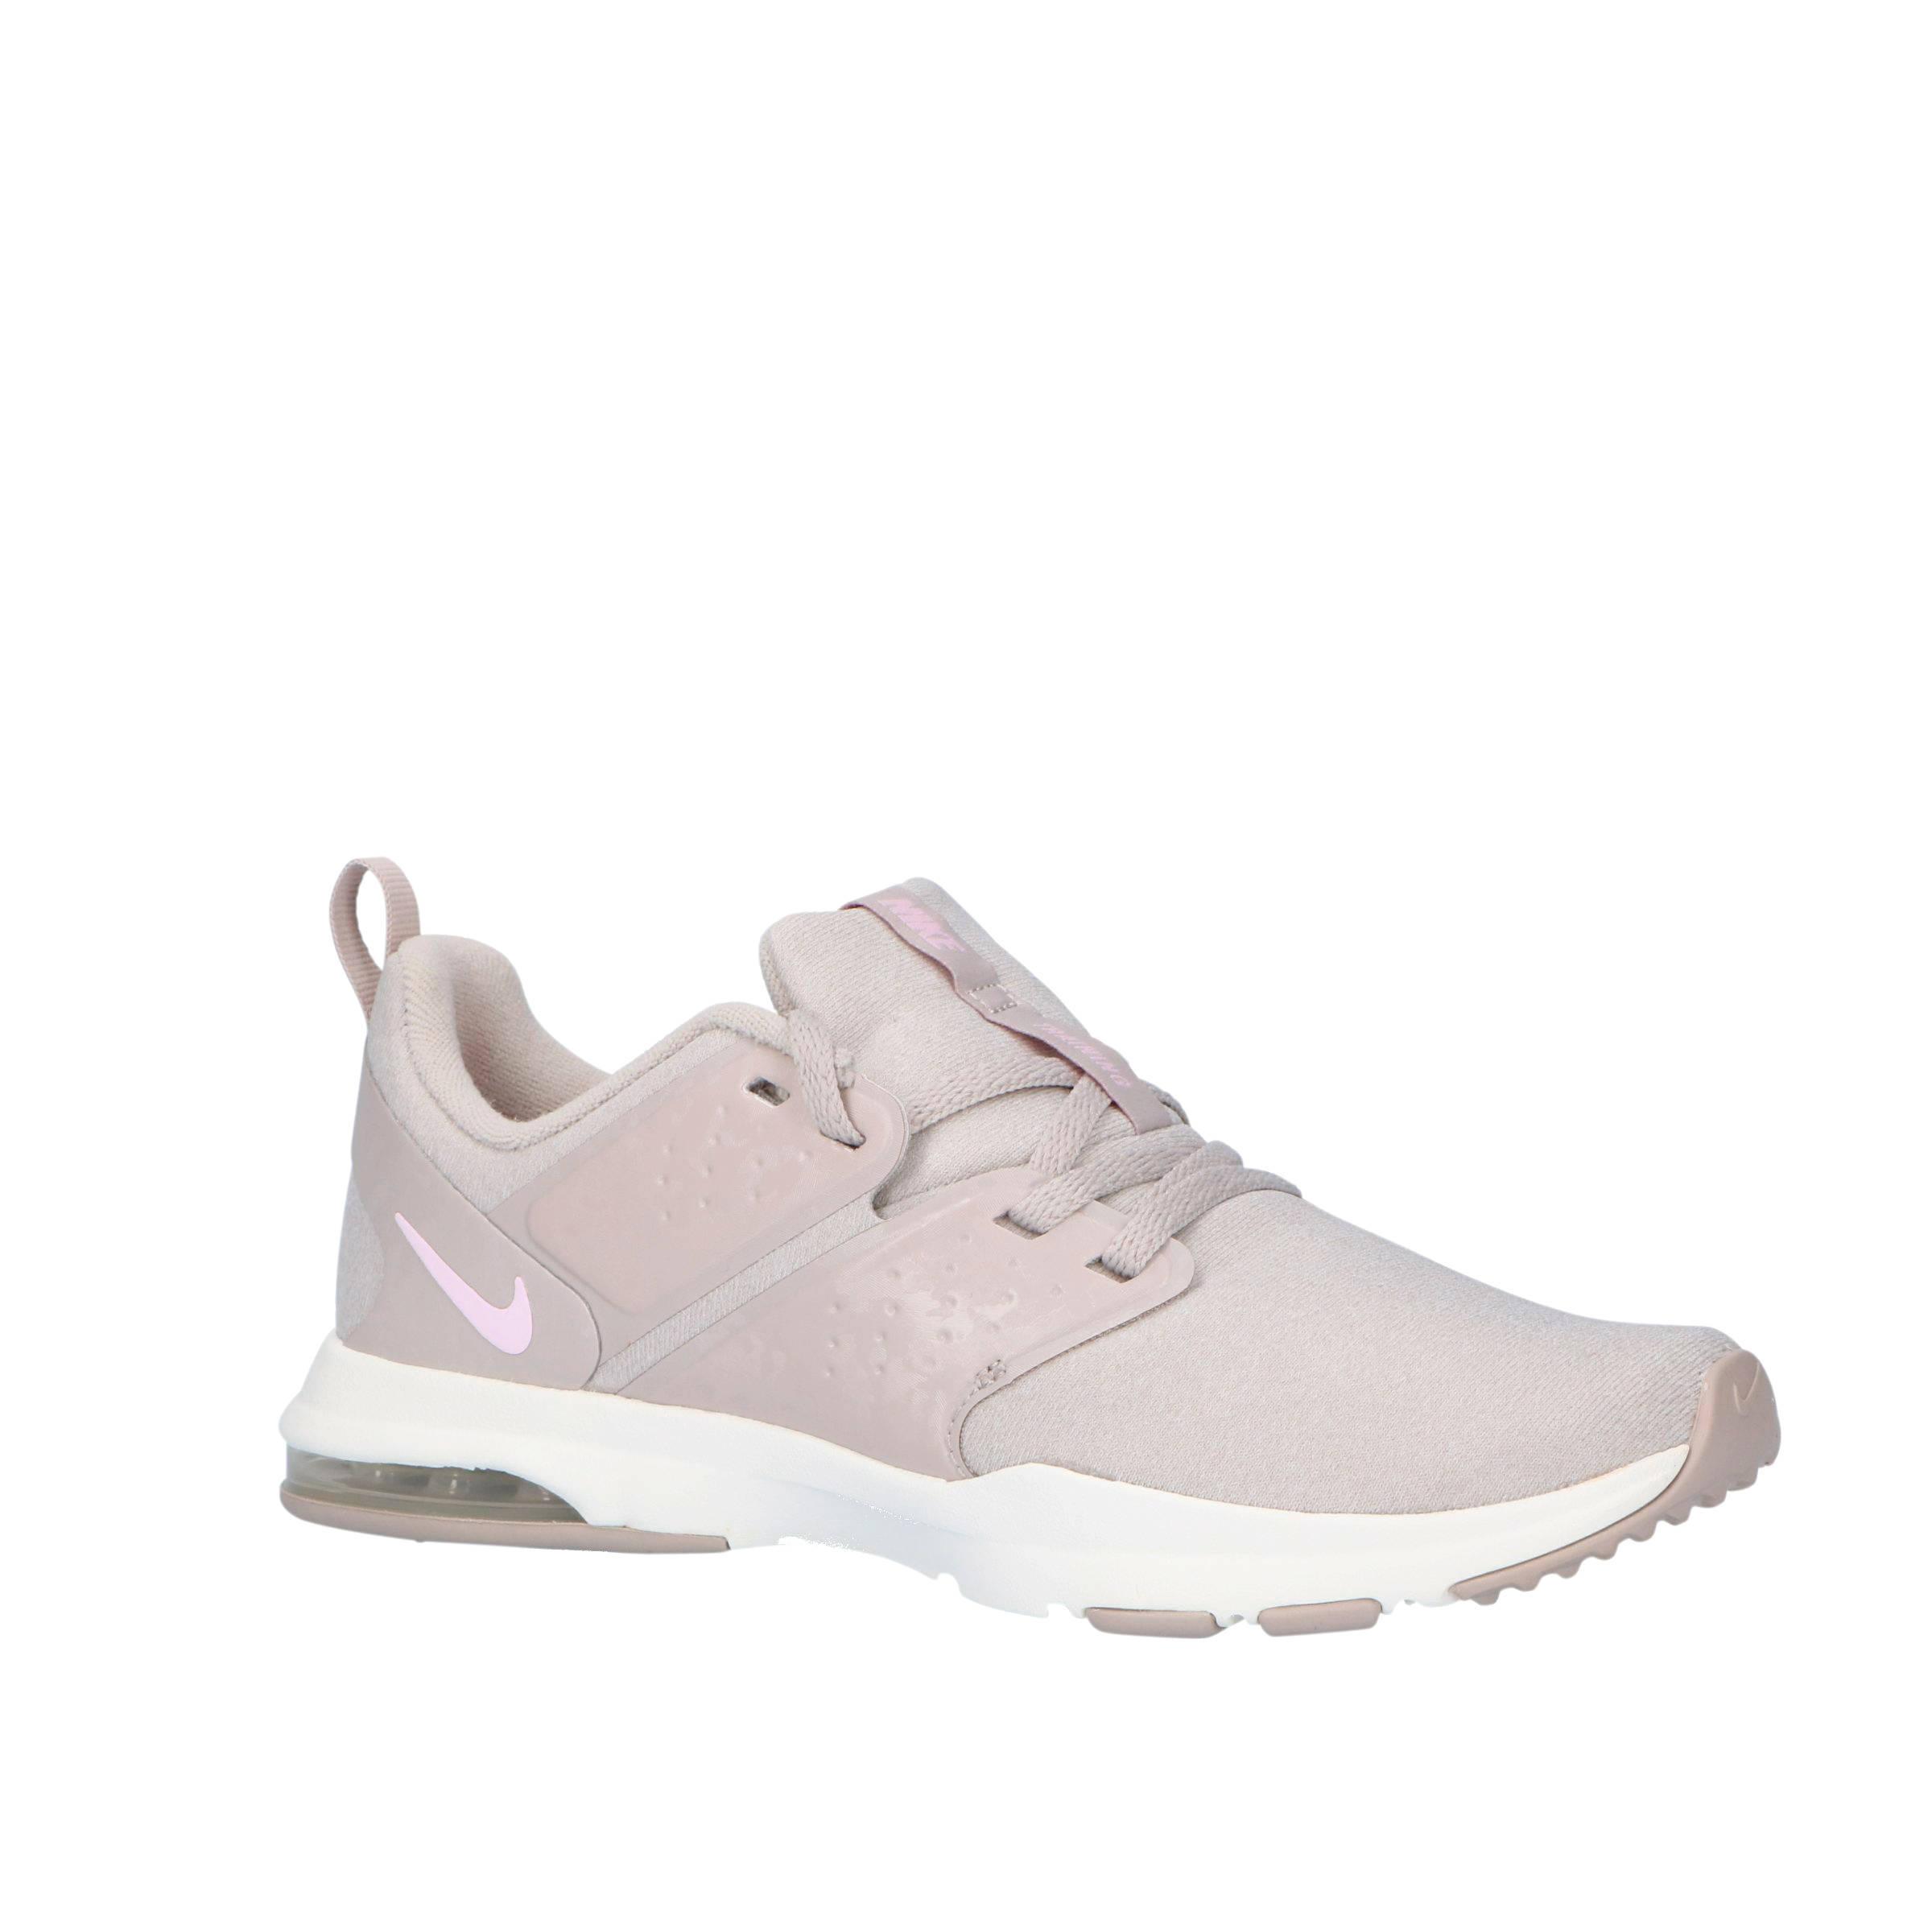 outlet store 1ceb8 a6fb8 nike-air-bella-tr-fitness-schoenen-grijs-0882801563027.jpg